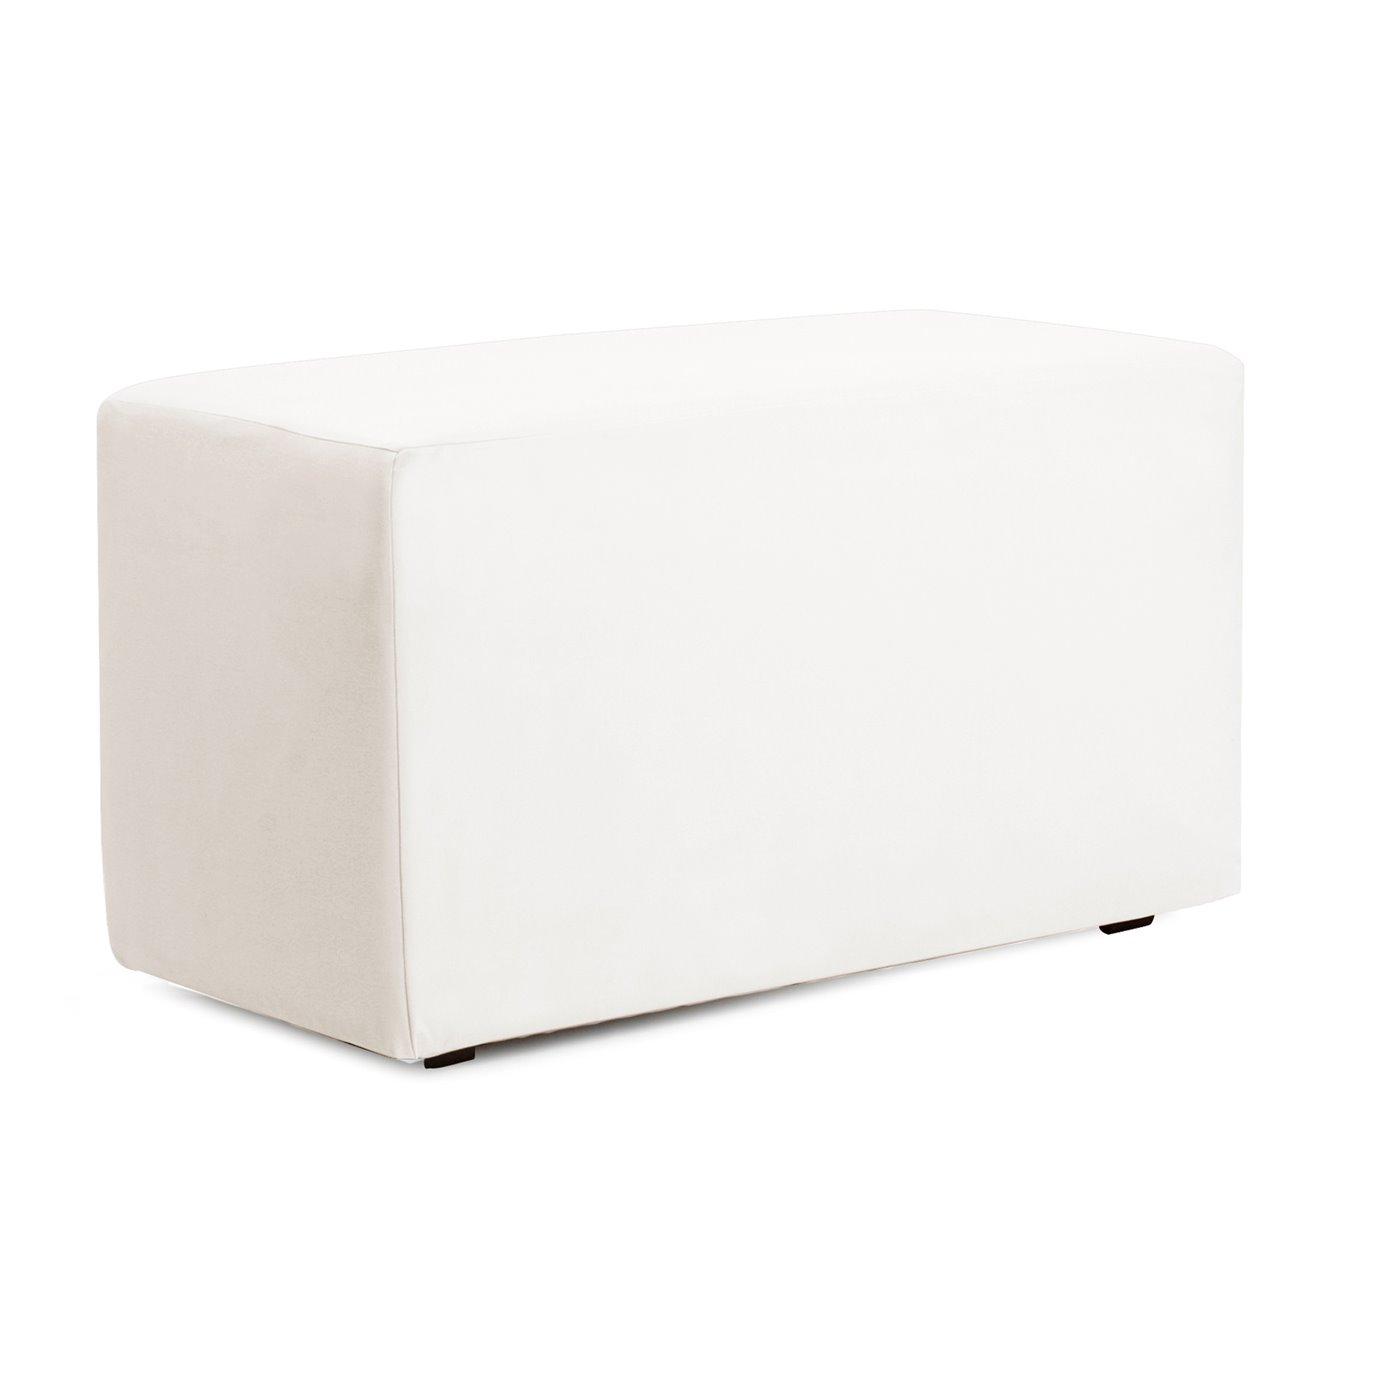 Howard Elliott Universal Bench Cover Outdoor Marine Grade Vinyl White - Cover Only, Base Not Included